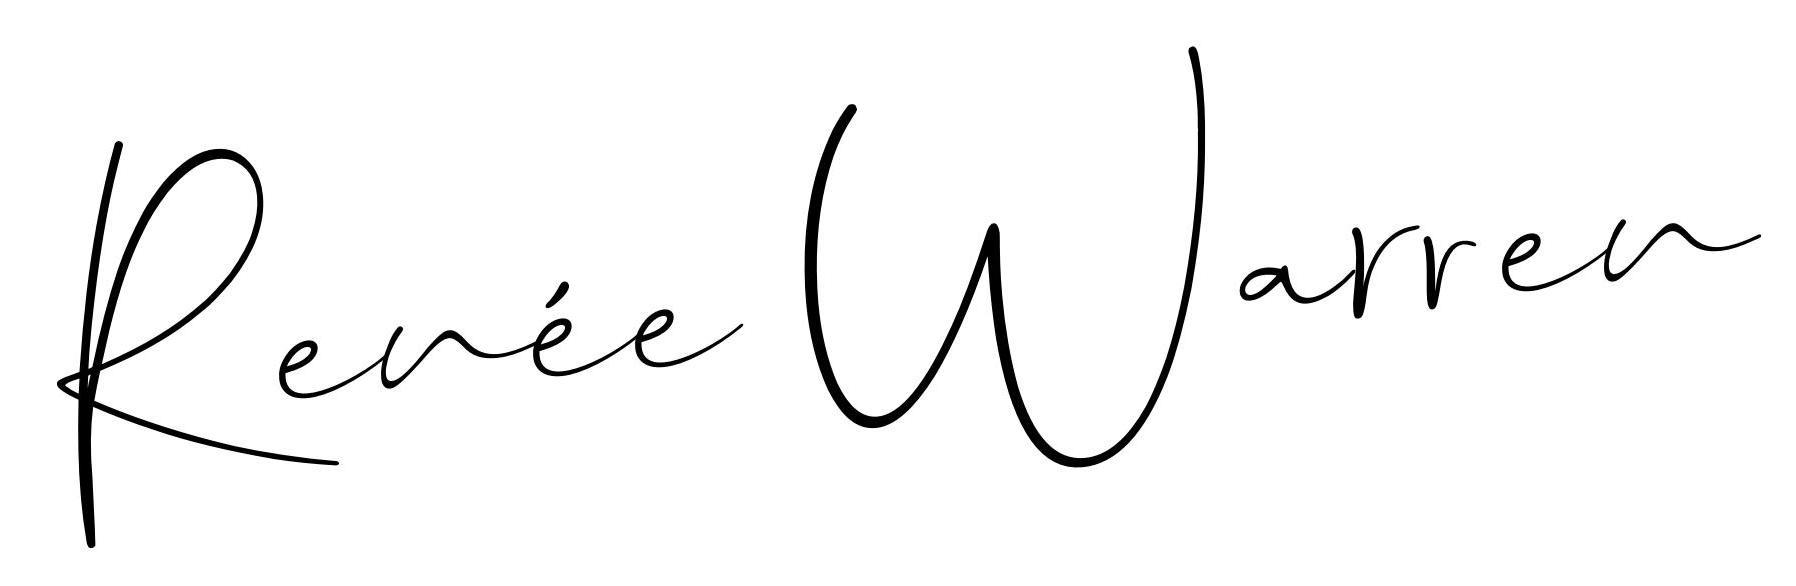 Renee Warren signature